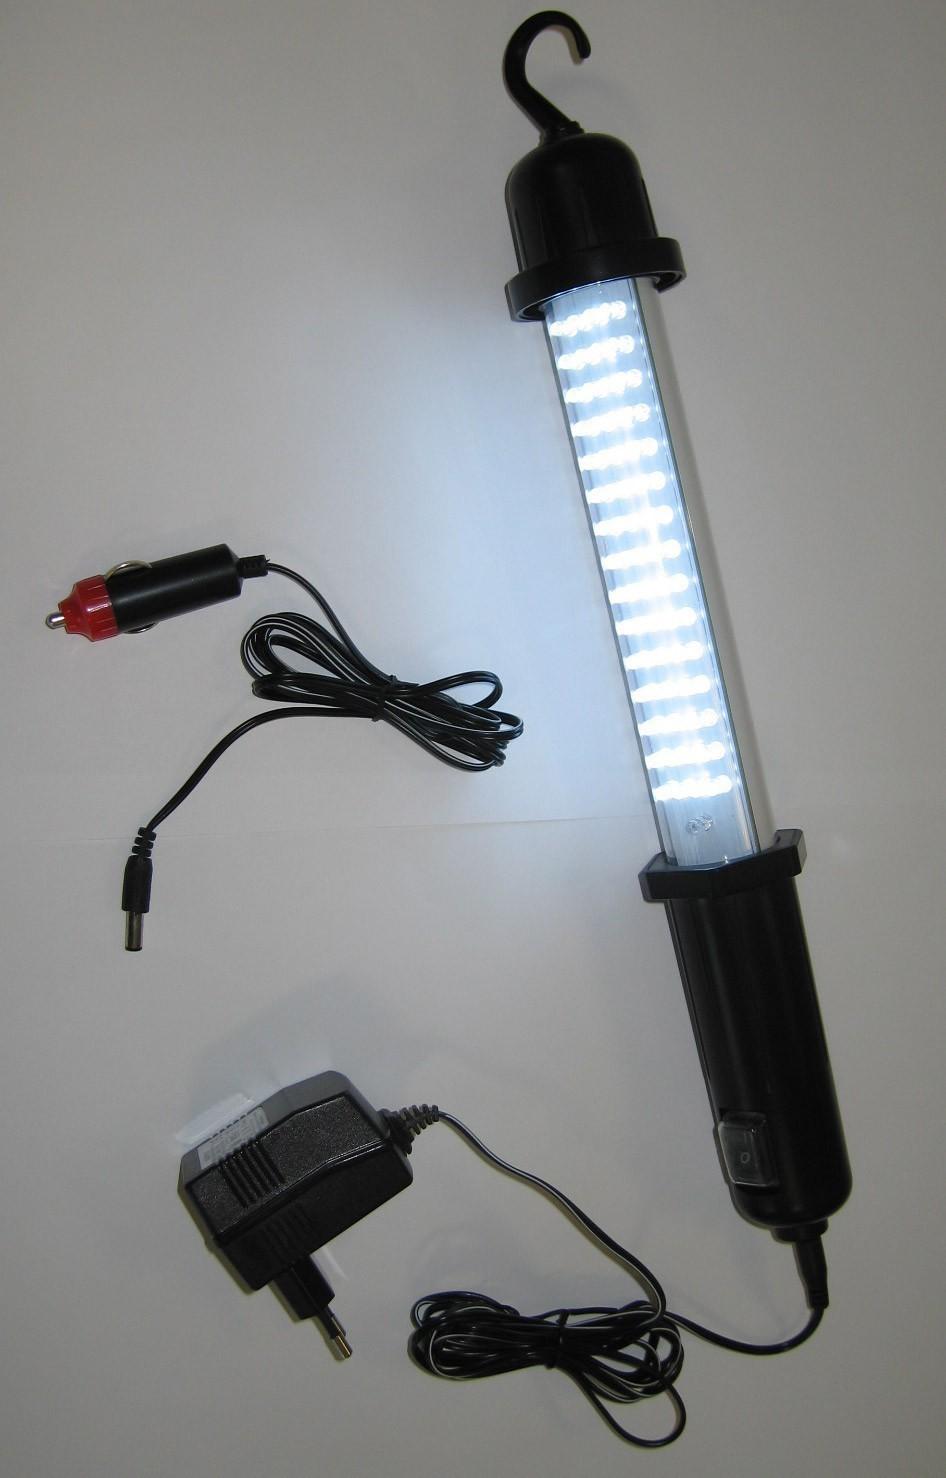 LED Akku Handleuchte / Werkstattleuchte / Handlampe 60 LED´s Bild 2